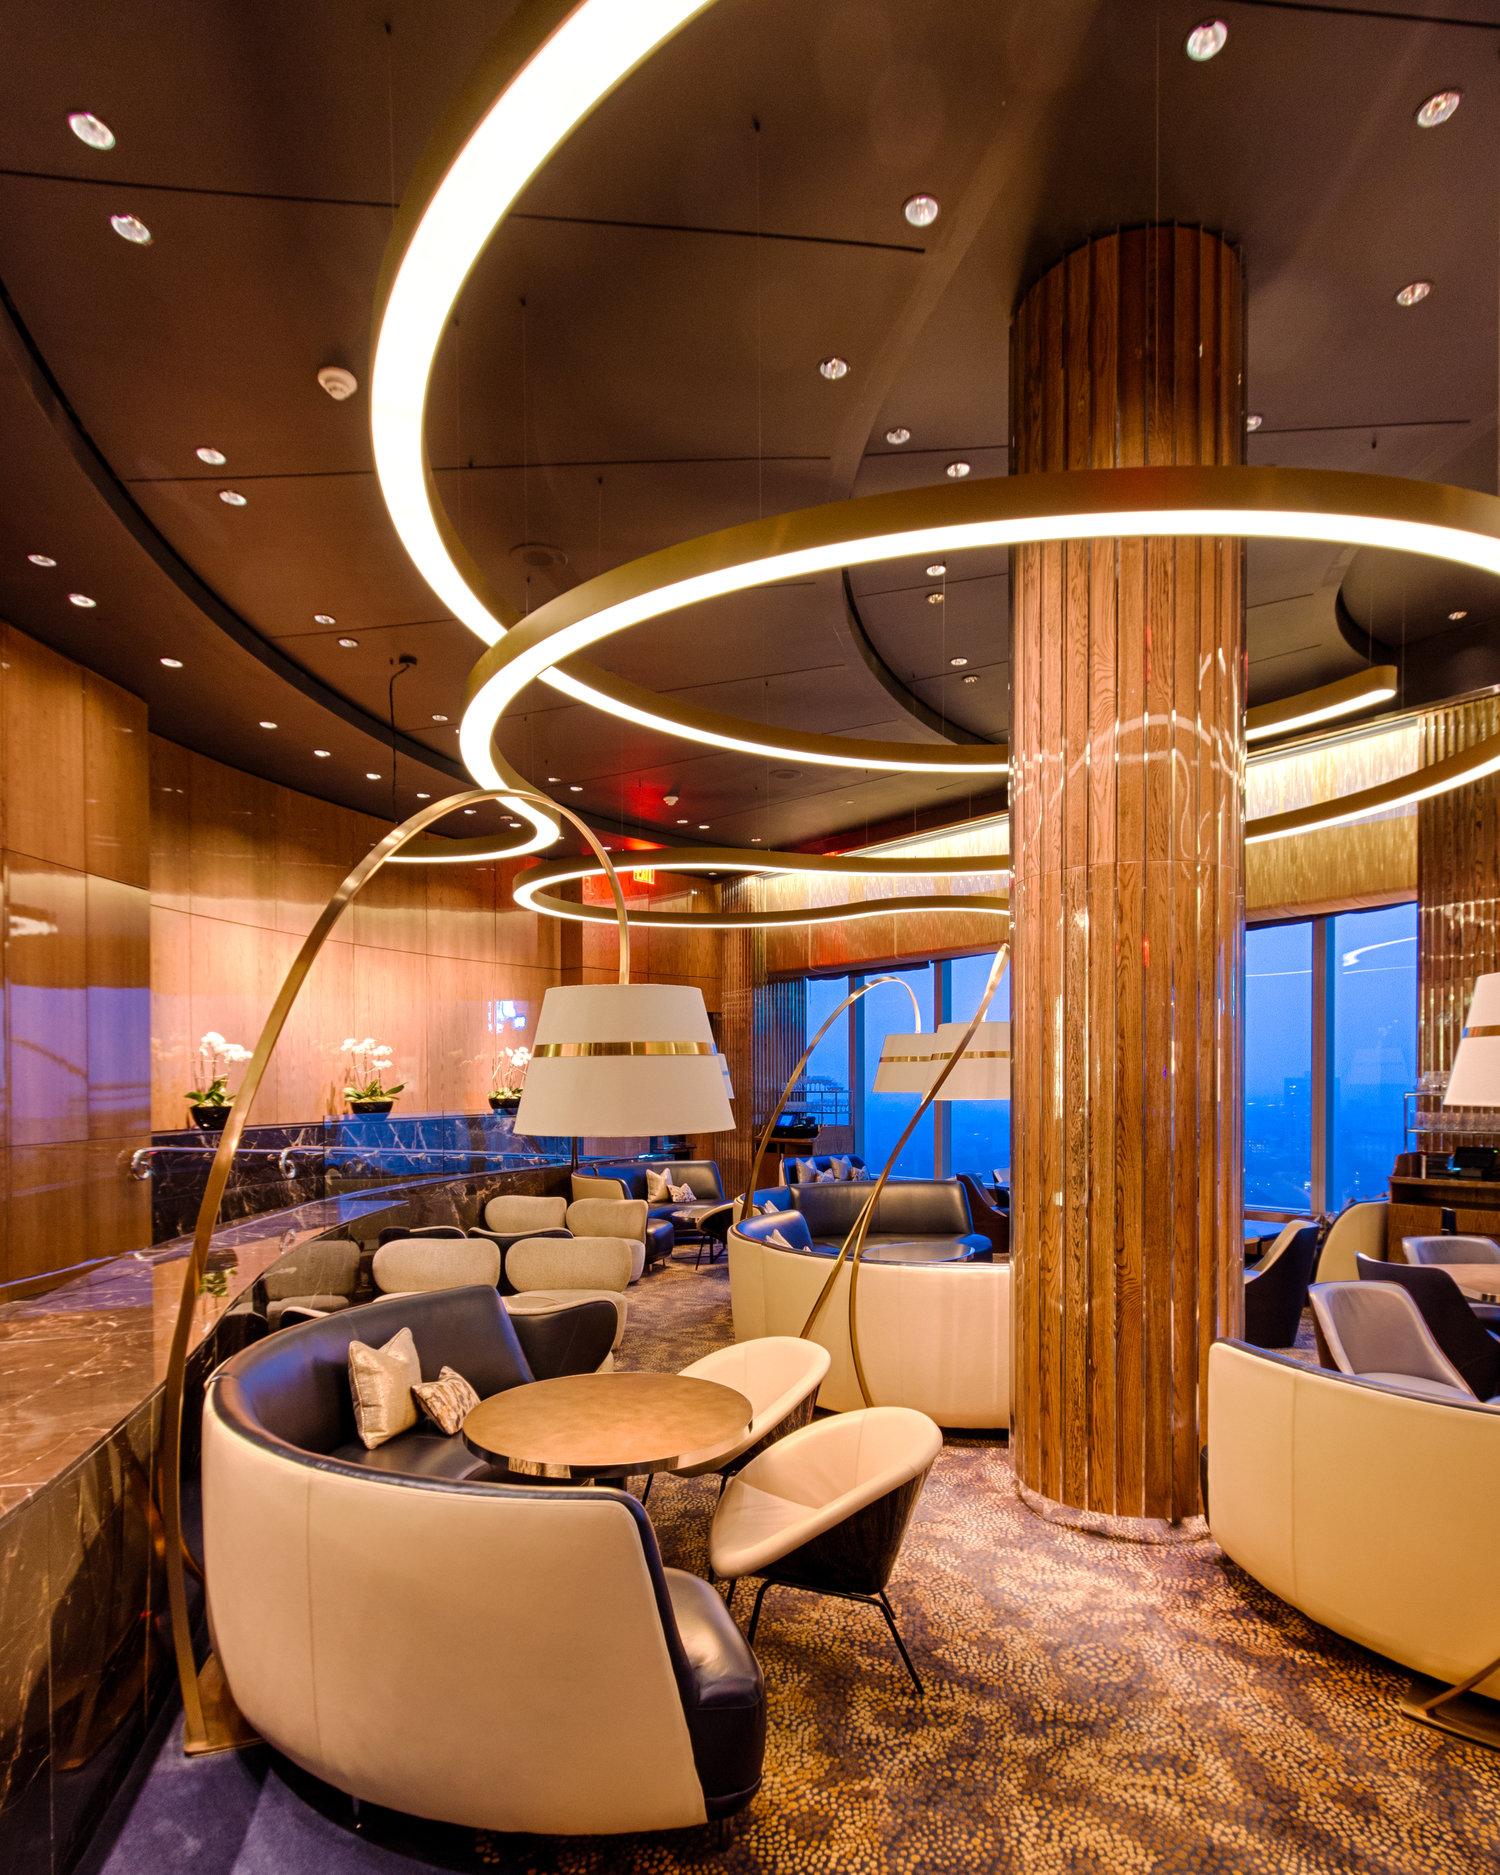 The Aviary Focus Lighting Architectural Lighting Design